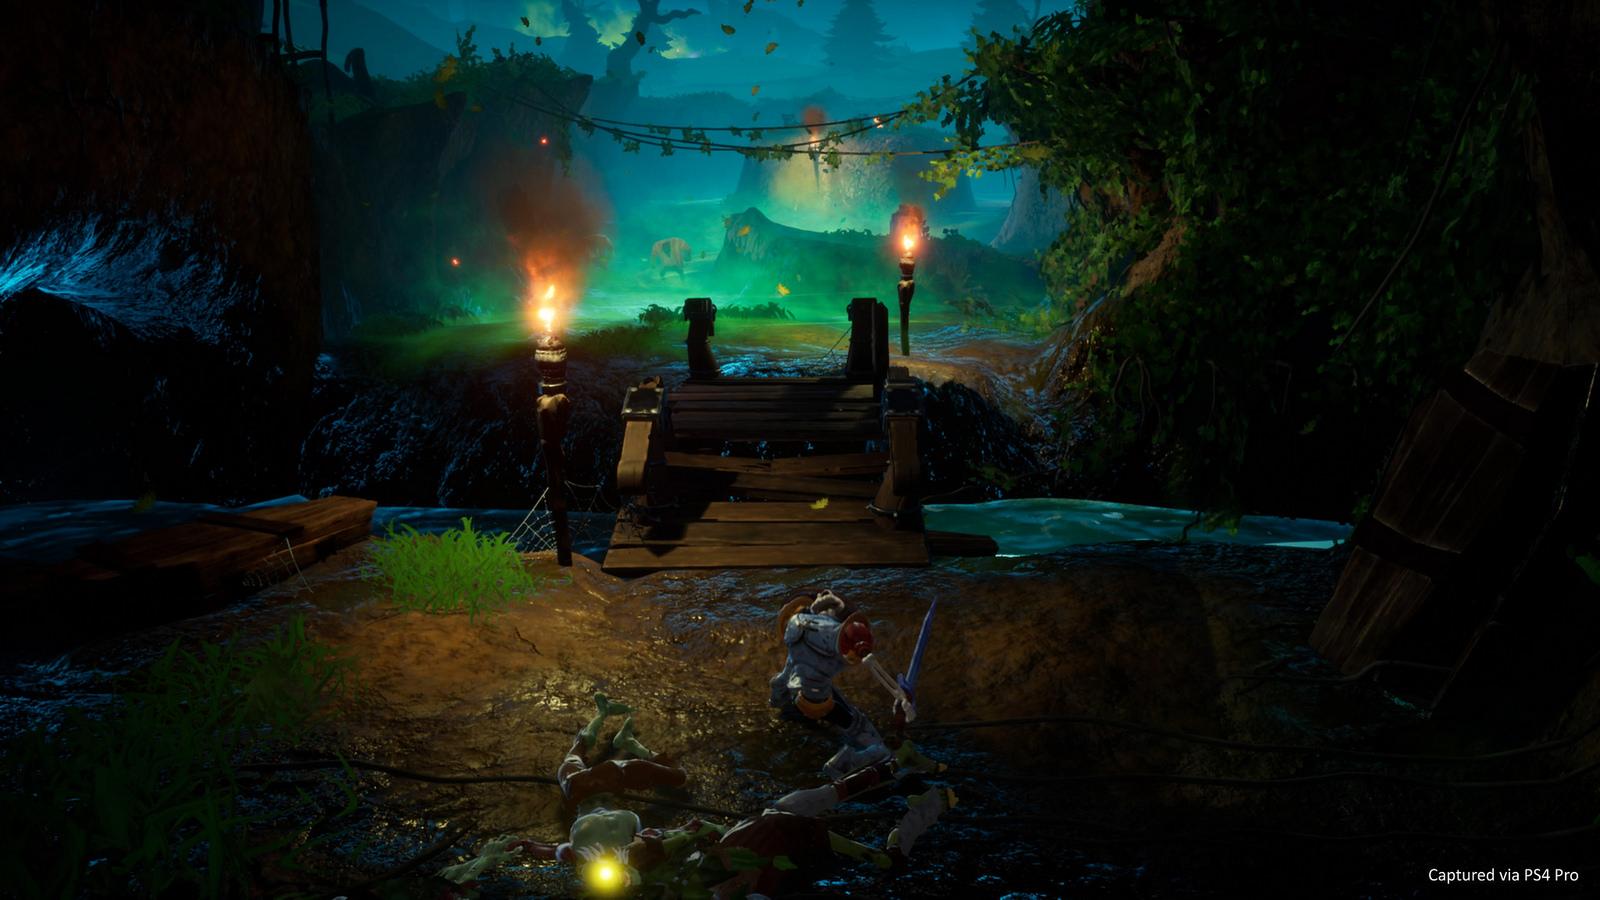 PS经典动作游戏《骷髅骑士》完全重制明年登陆PS4